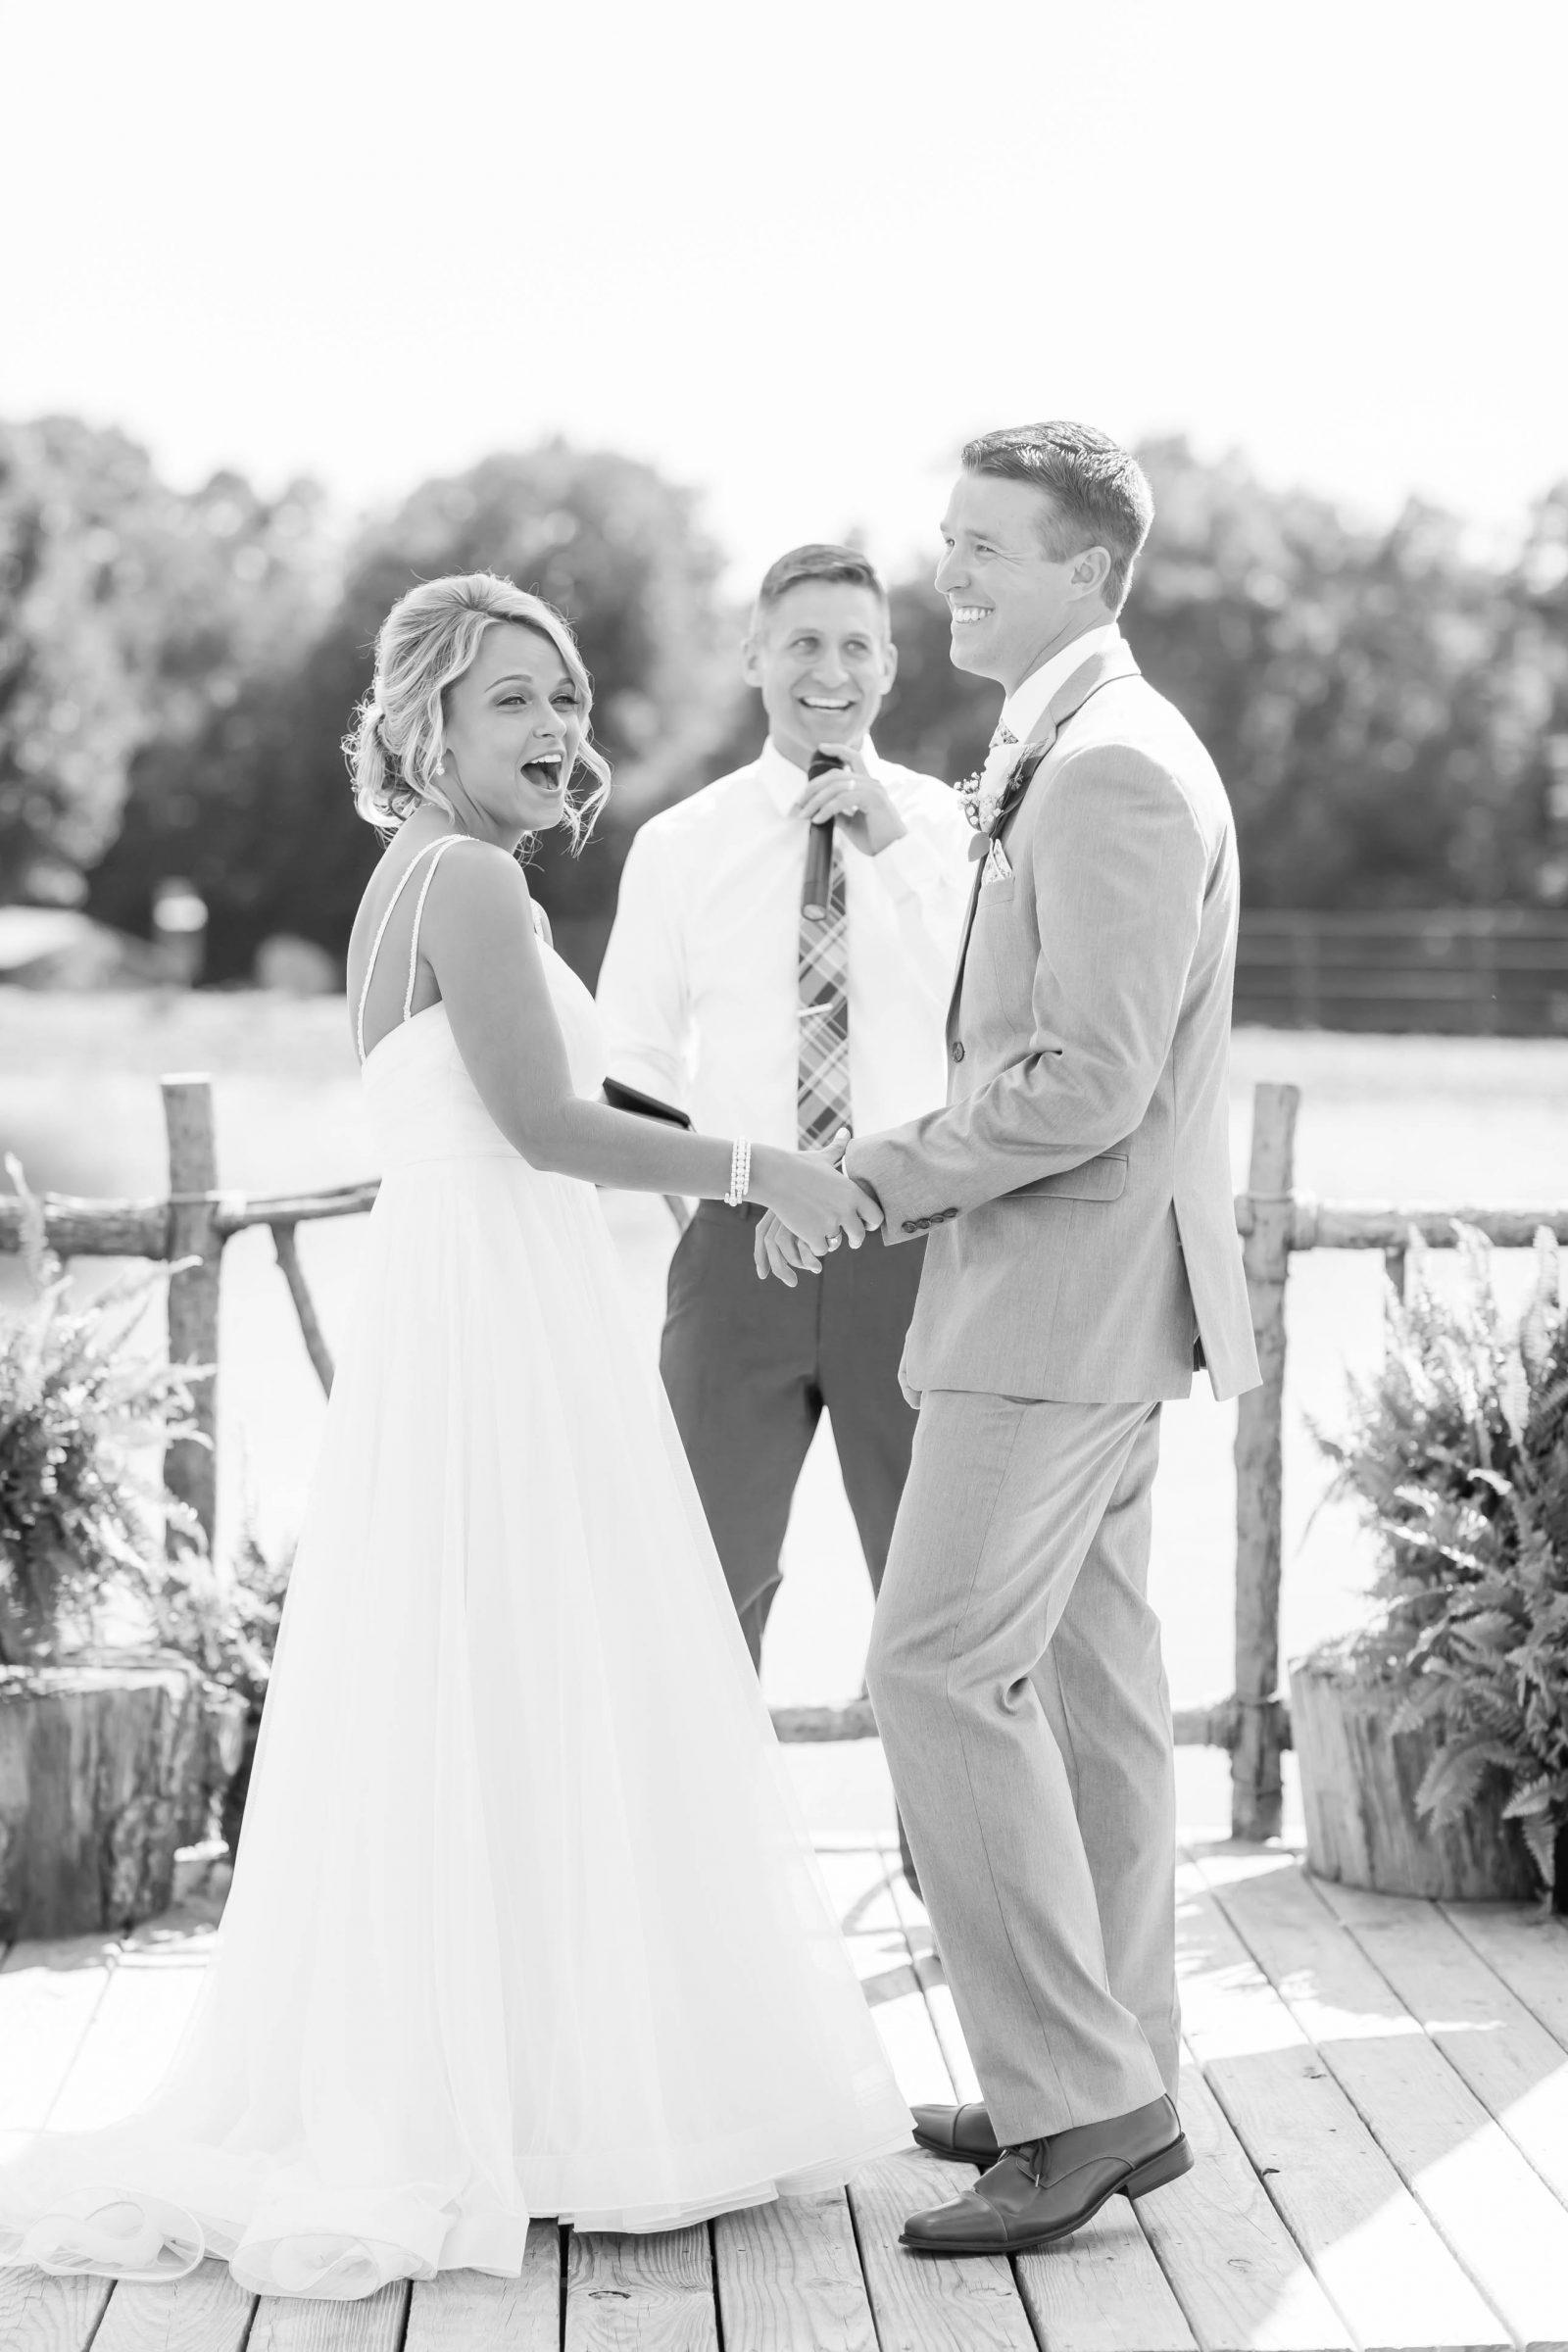 peacock-ridge-summer-wedding-photographer-akron-ohio-loren-jackson-photography-79